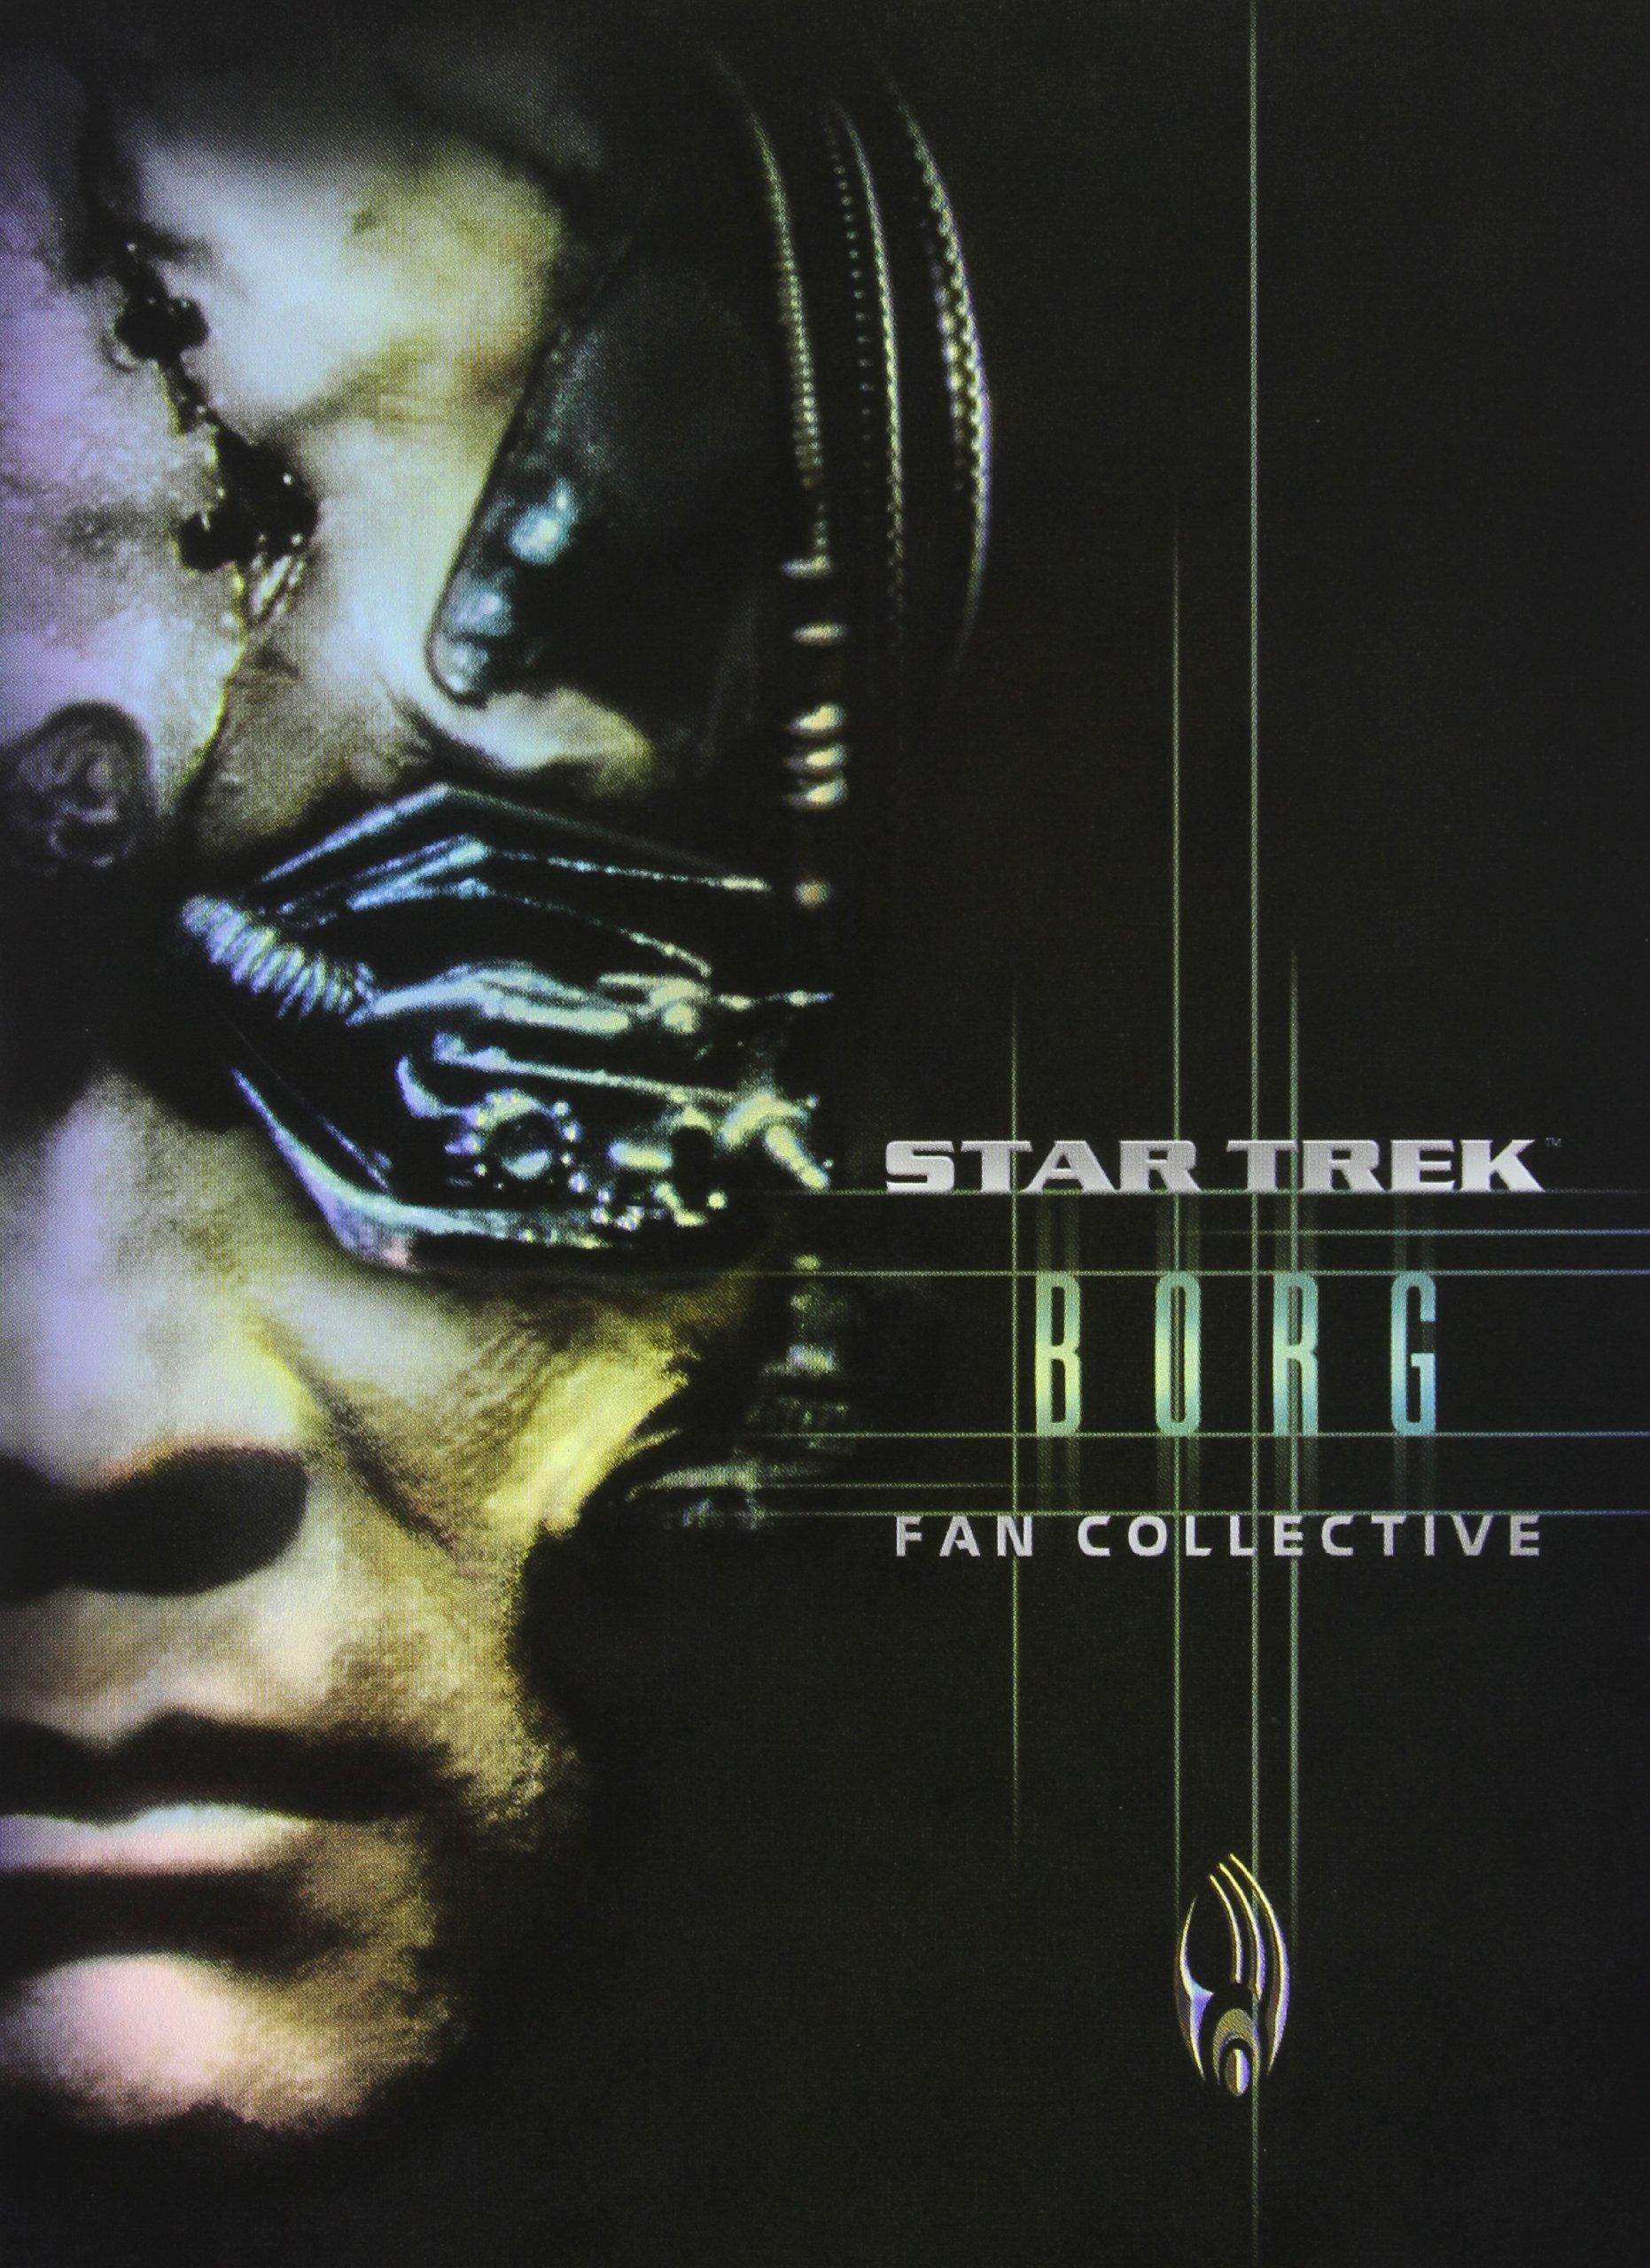 Star Trek Fan Collective - Borg